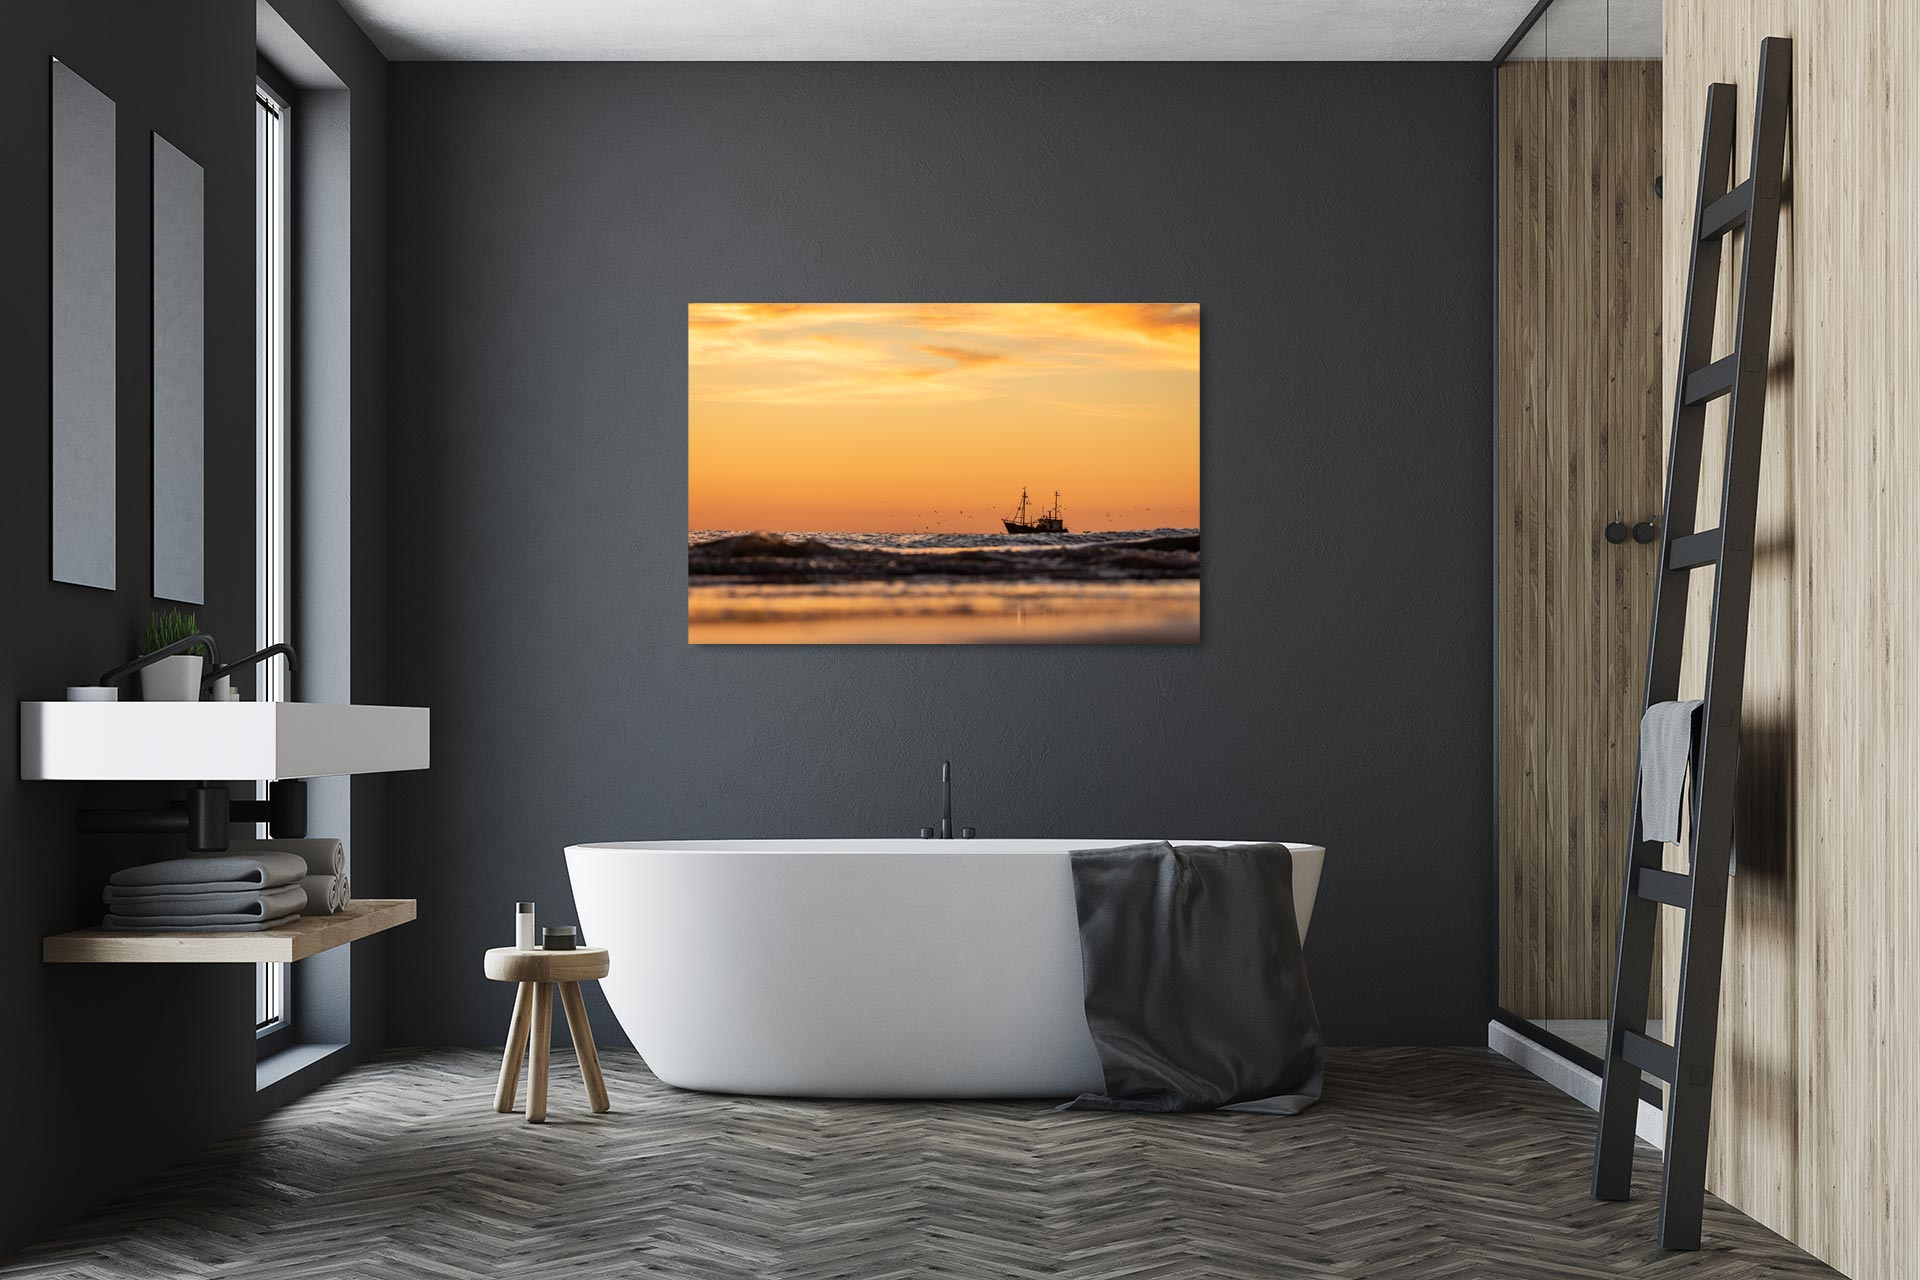 Krabbenkutter Bild auf Leinwand, Acrylglas, Aludibond